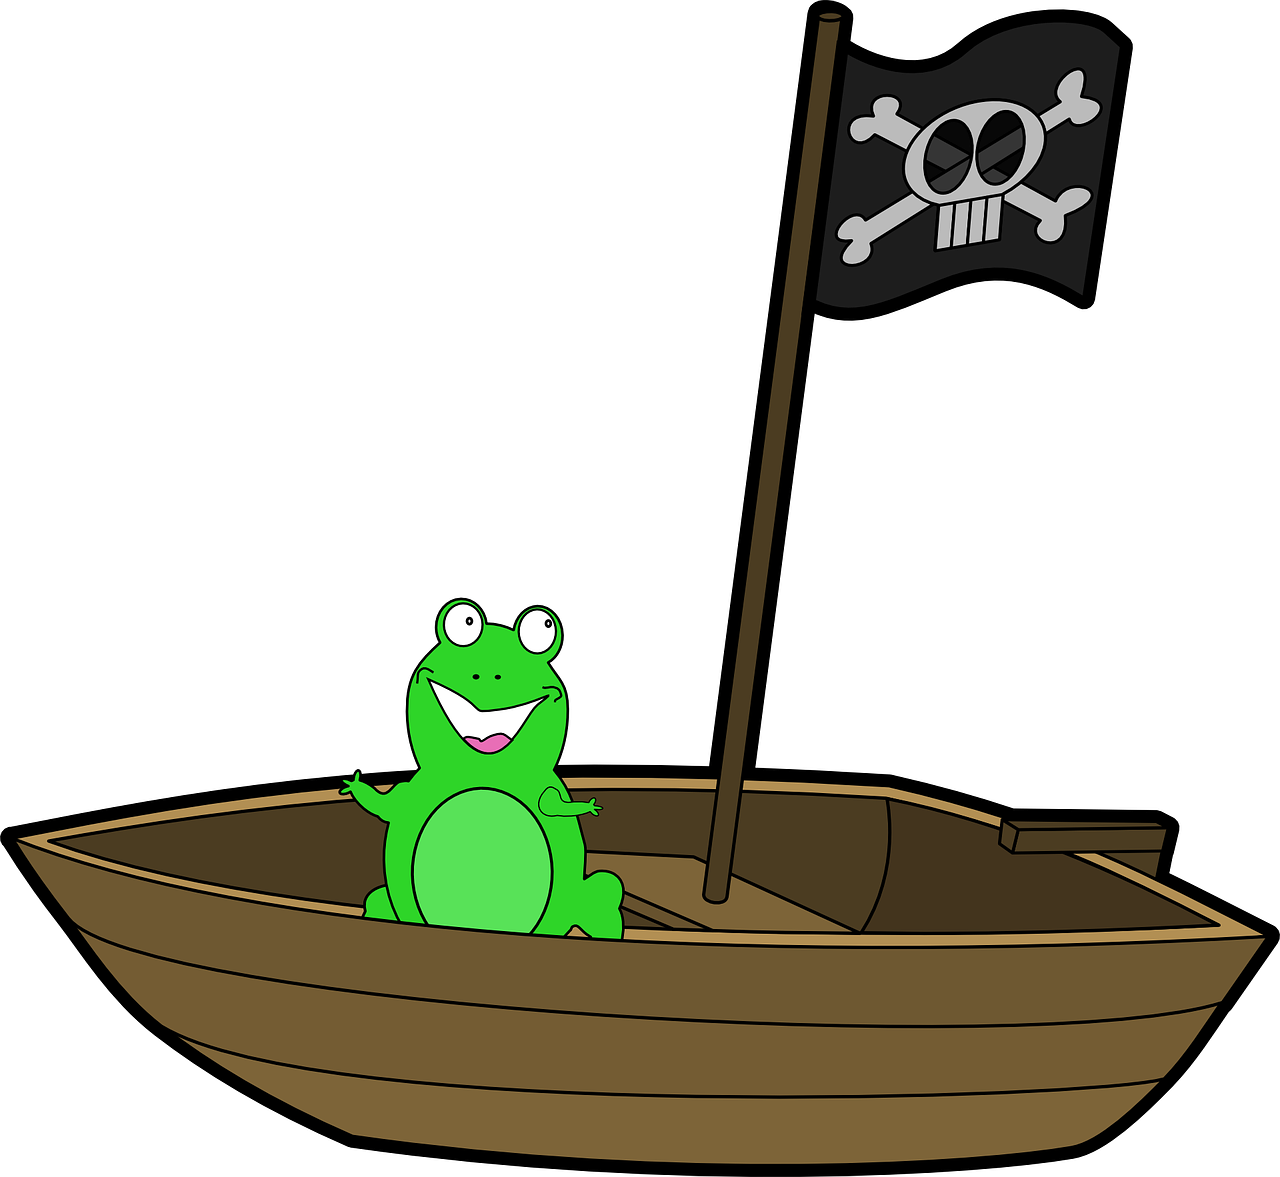 boat boat frog smiling green pirate flag boat boat frog rh pinterest com Pirate Sword Clip Art Pirate Hat Clip Art